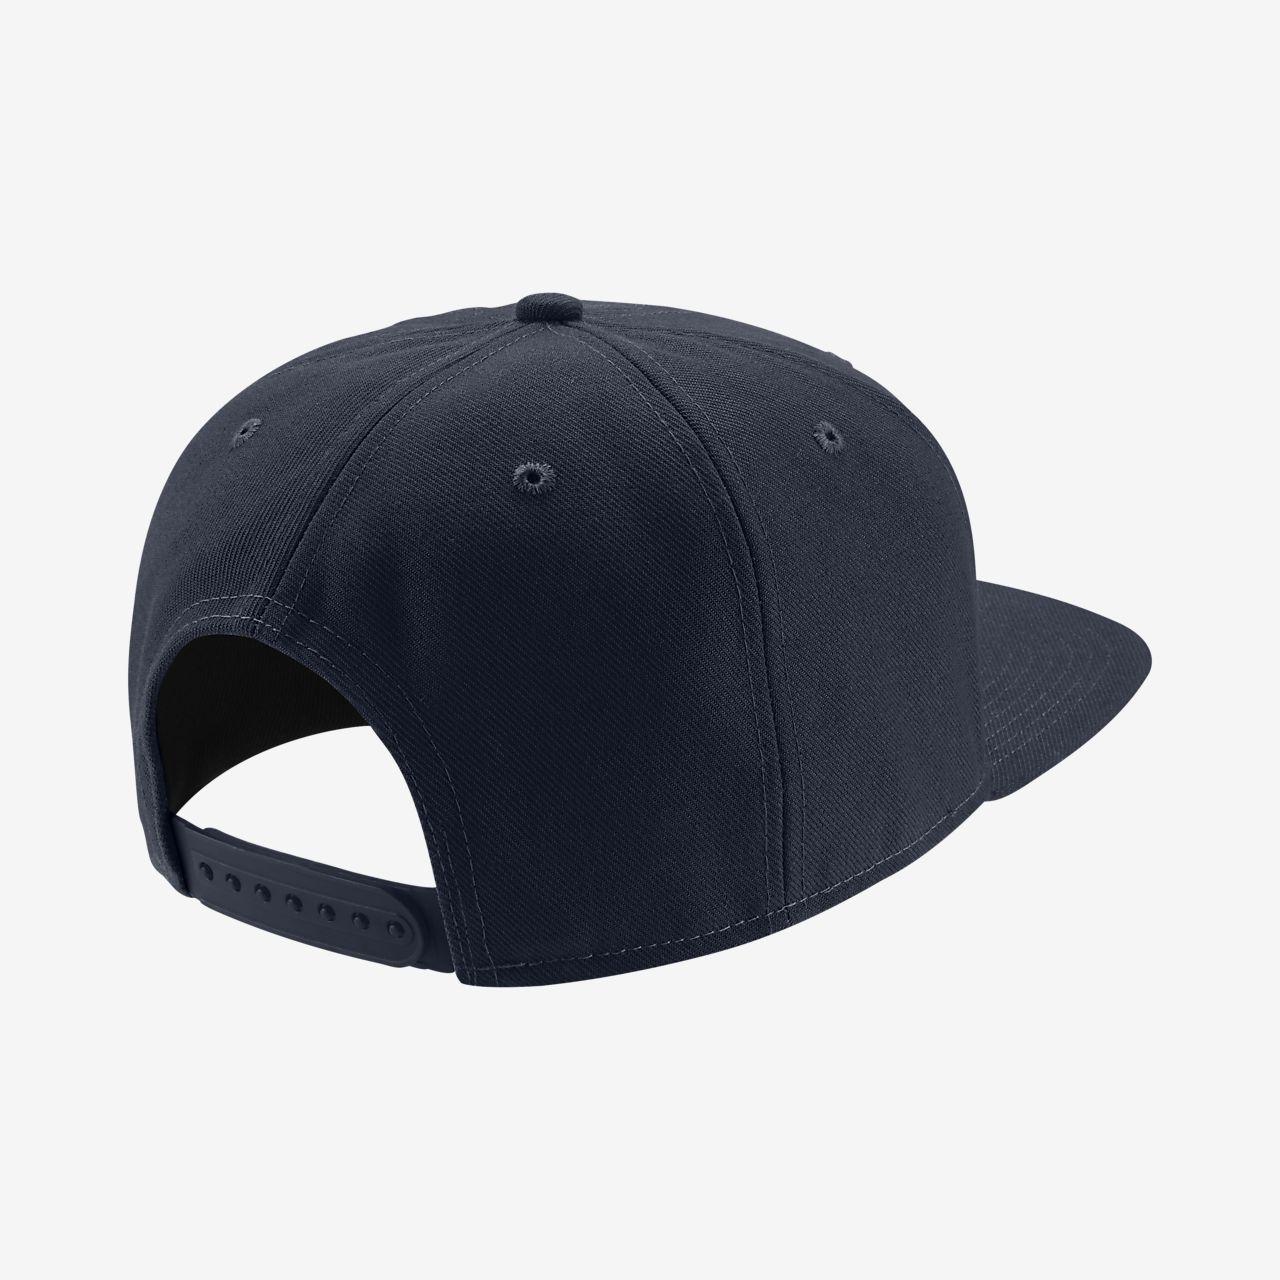 346af7aaa0d20 Nike Sportswear Pro Swoosh Adjustable Hat. Nike.com ZA